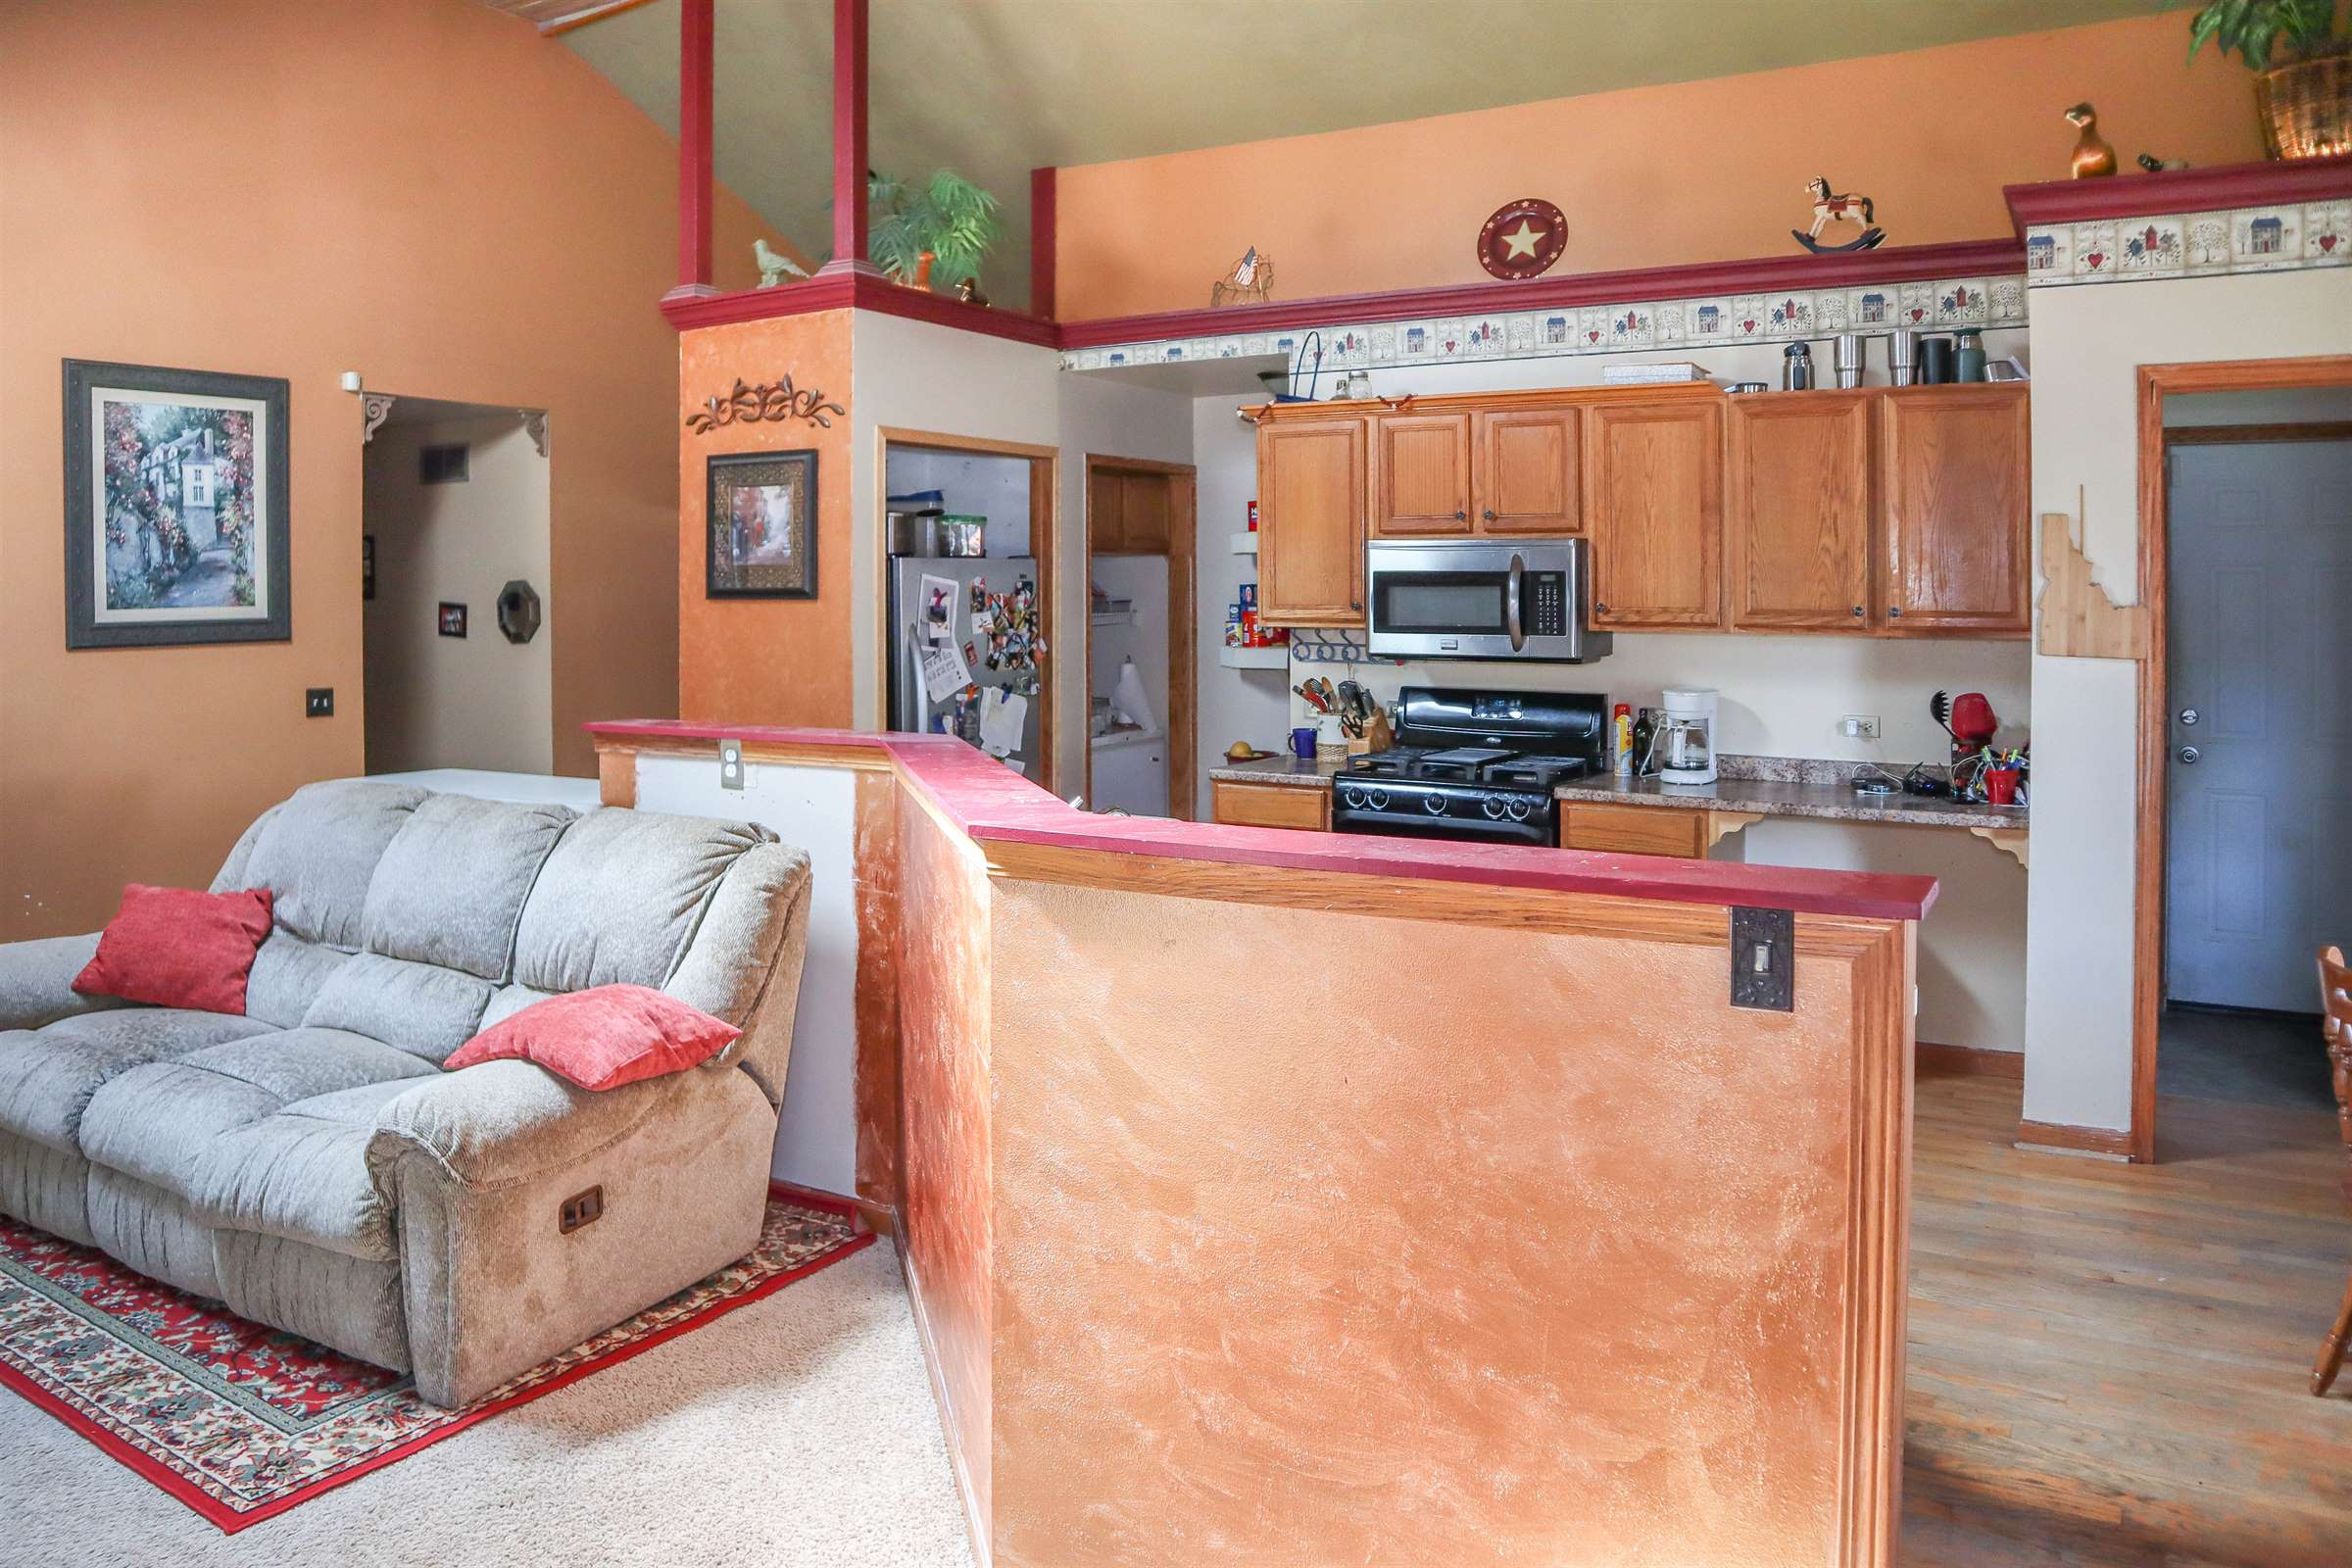 5208 Sunmeadow, Plainfield, IL 60586